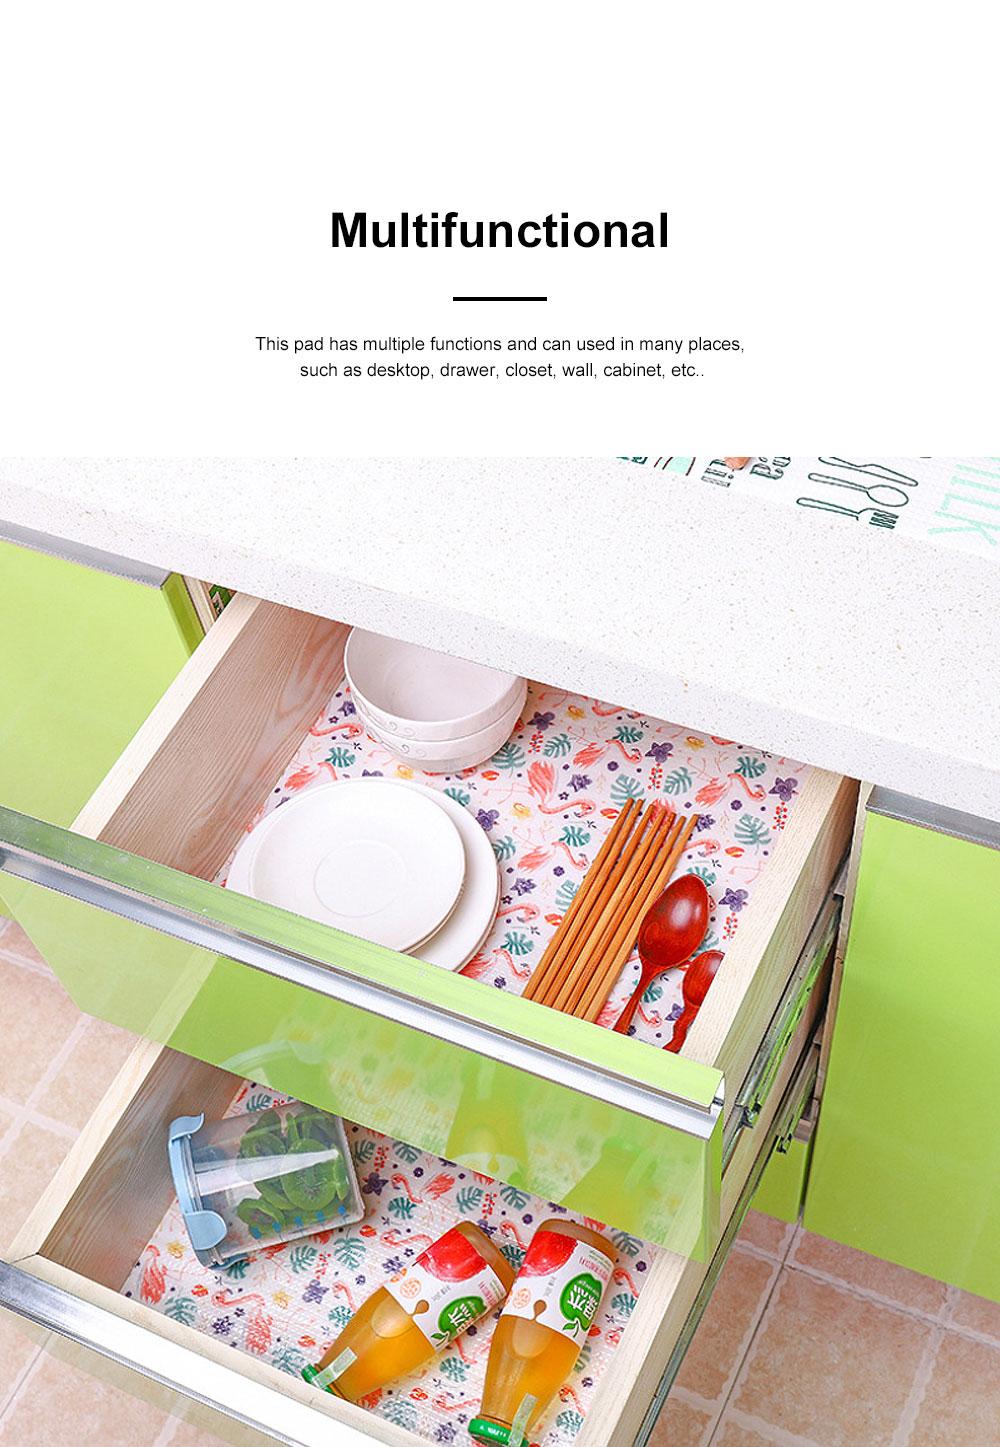 Cute Stylish Carton Painting Cuttable Waterproof Moisture-proof Oil-proof Drawer Wardrobe Closet Kitchen Cabinet Pad Mat 1